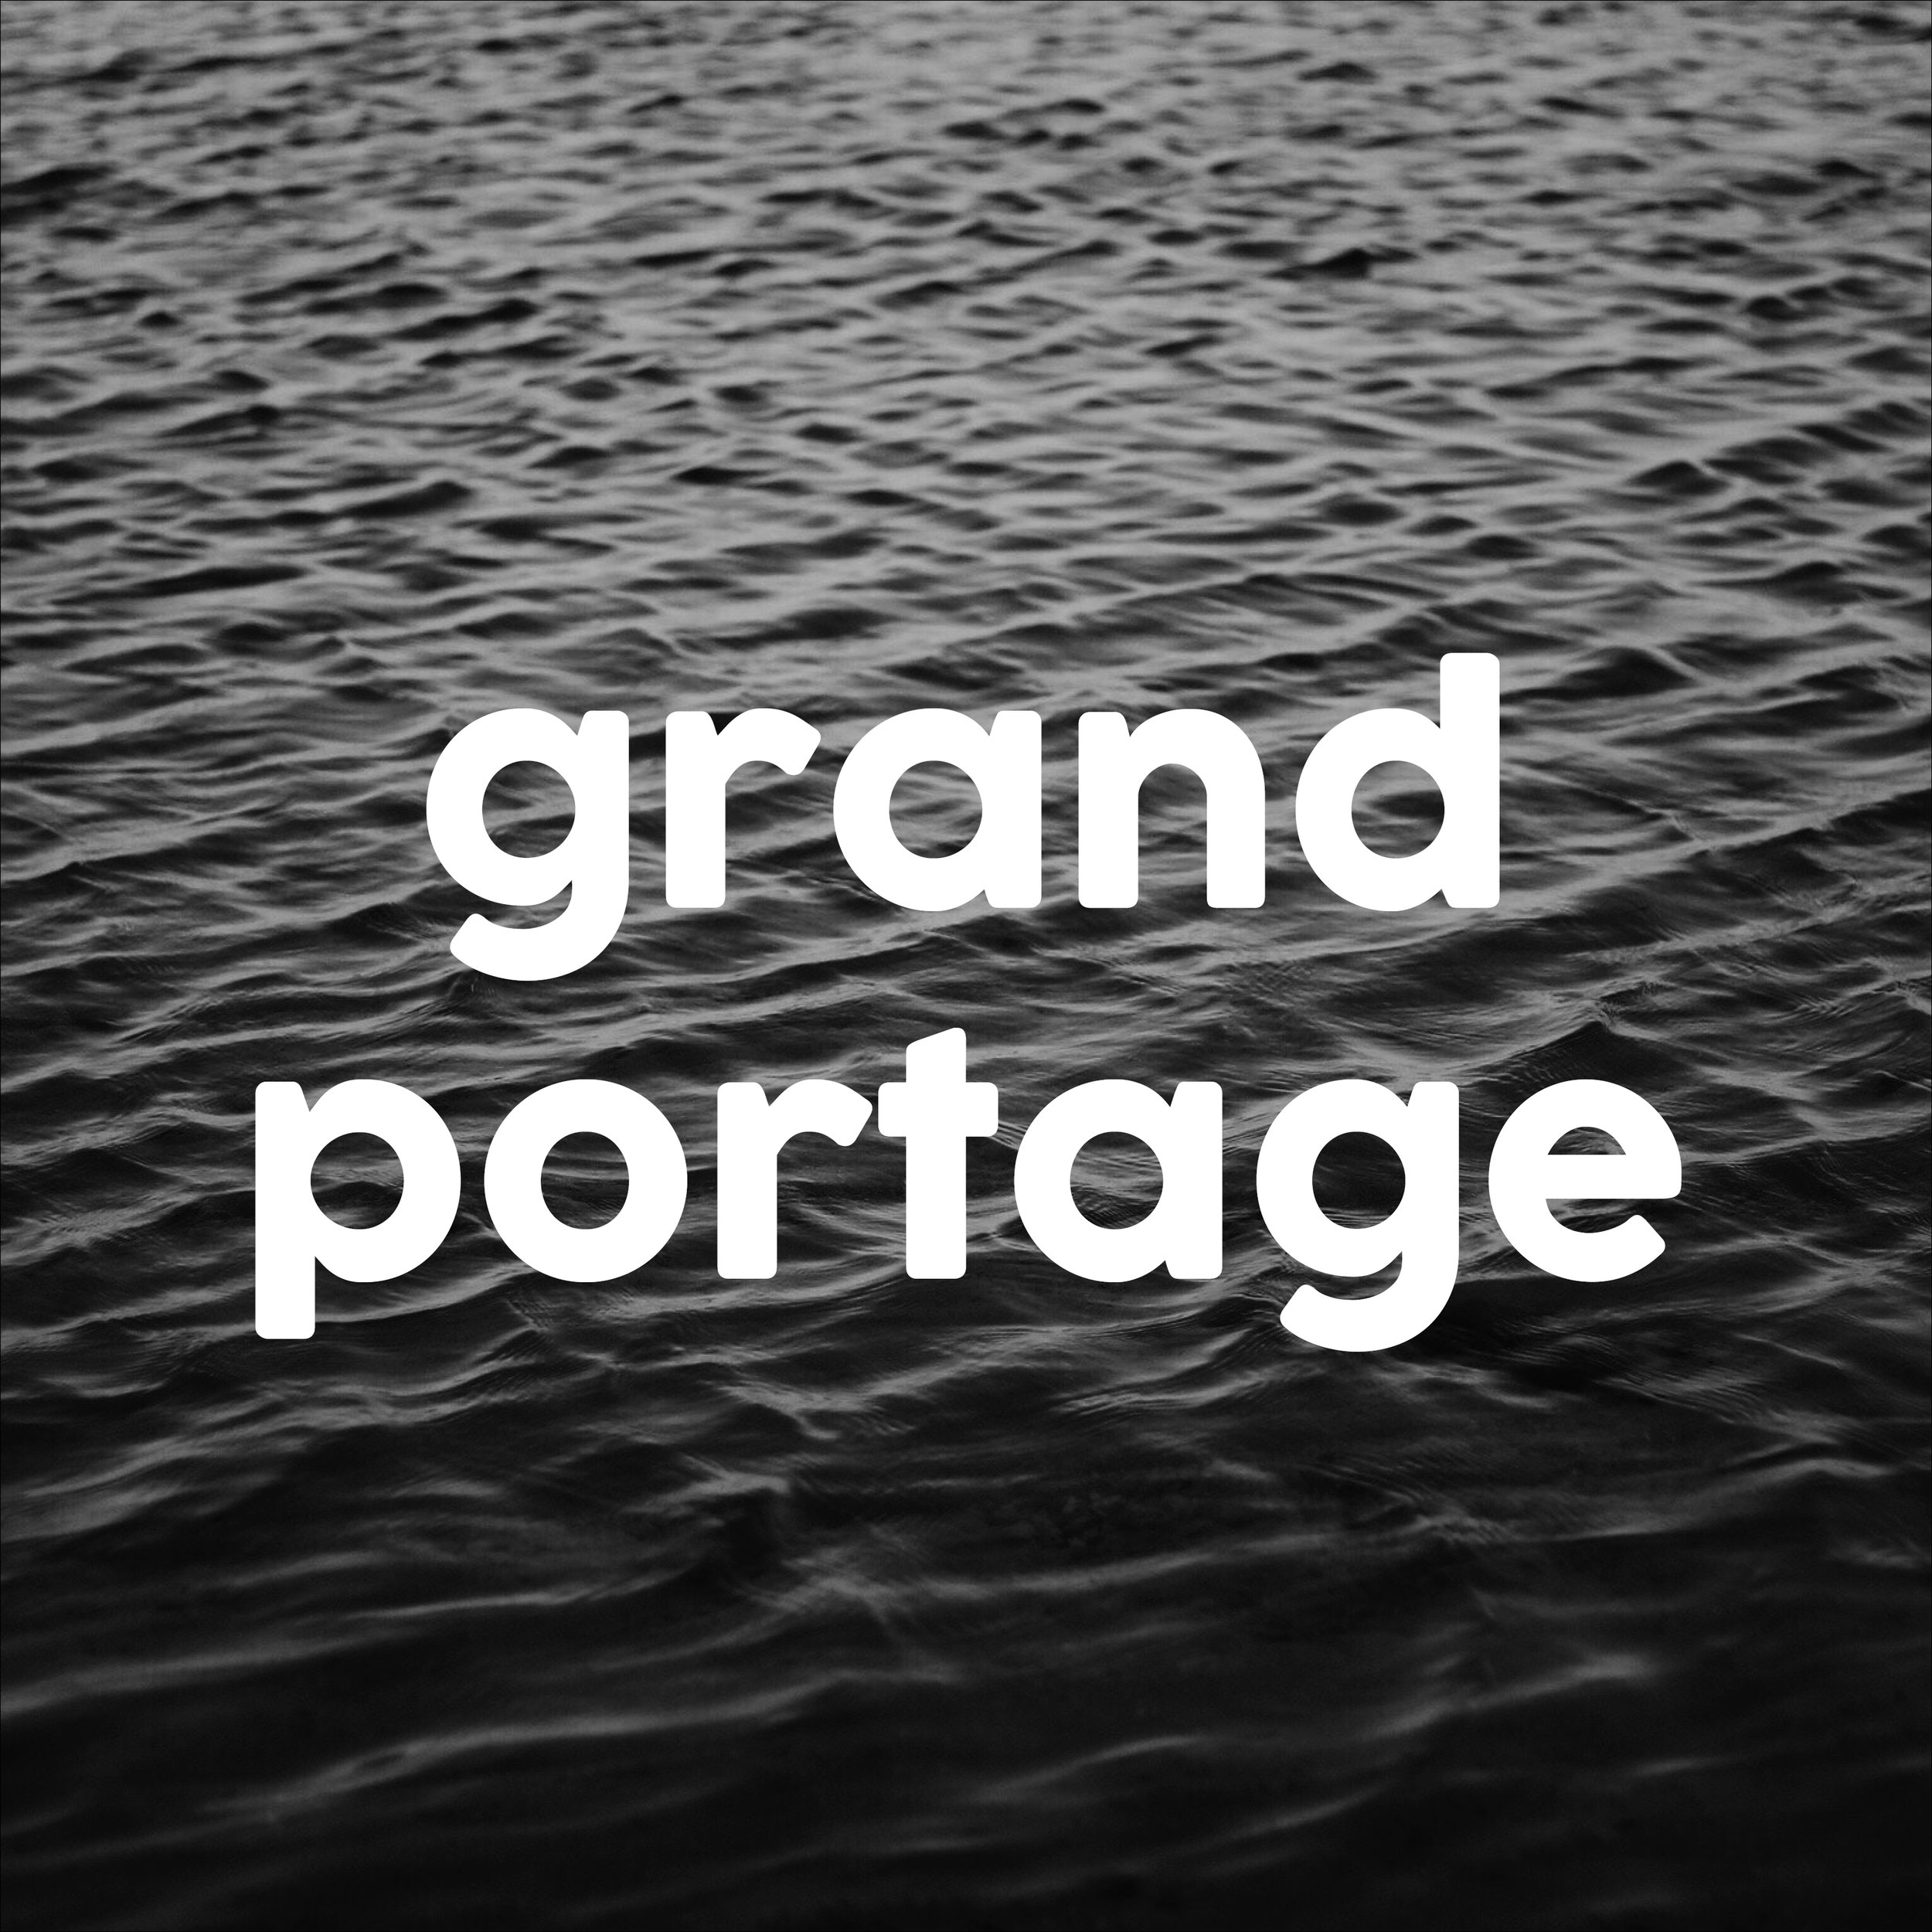 grand portage.jpg